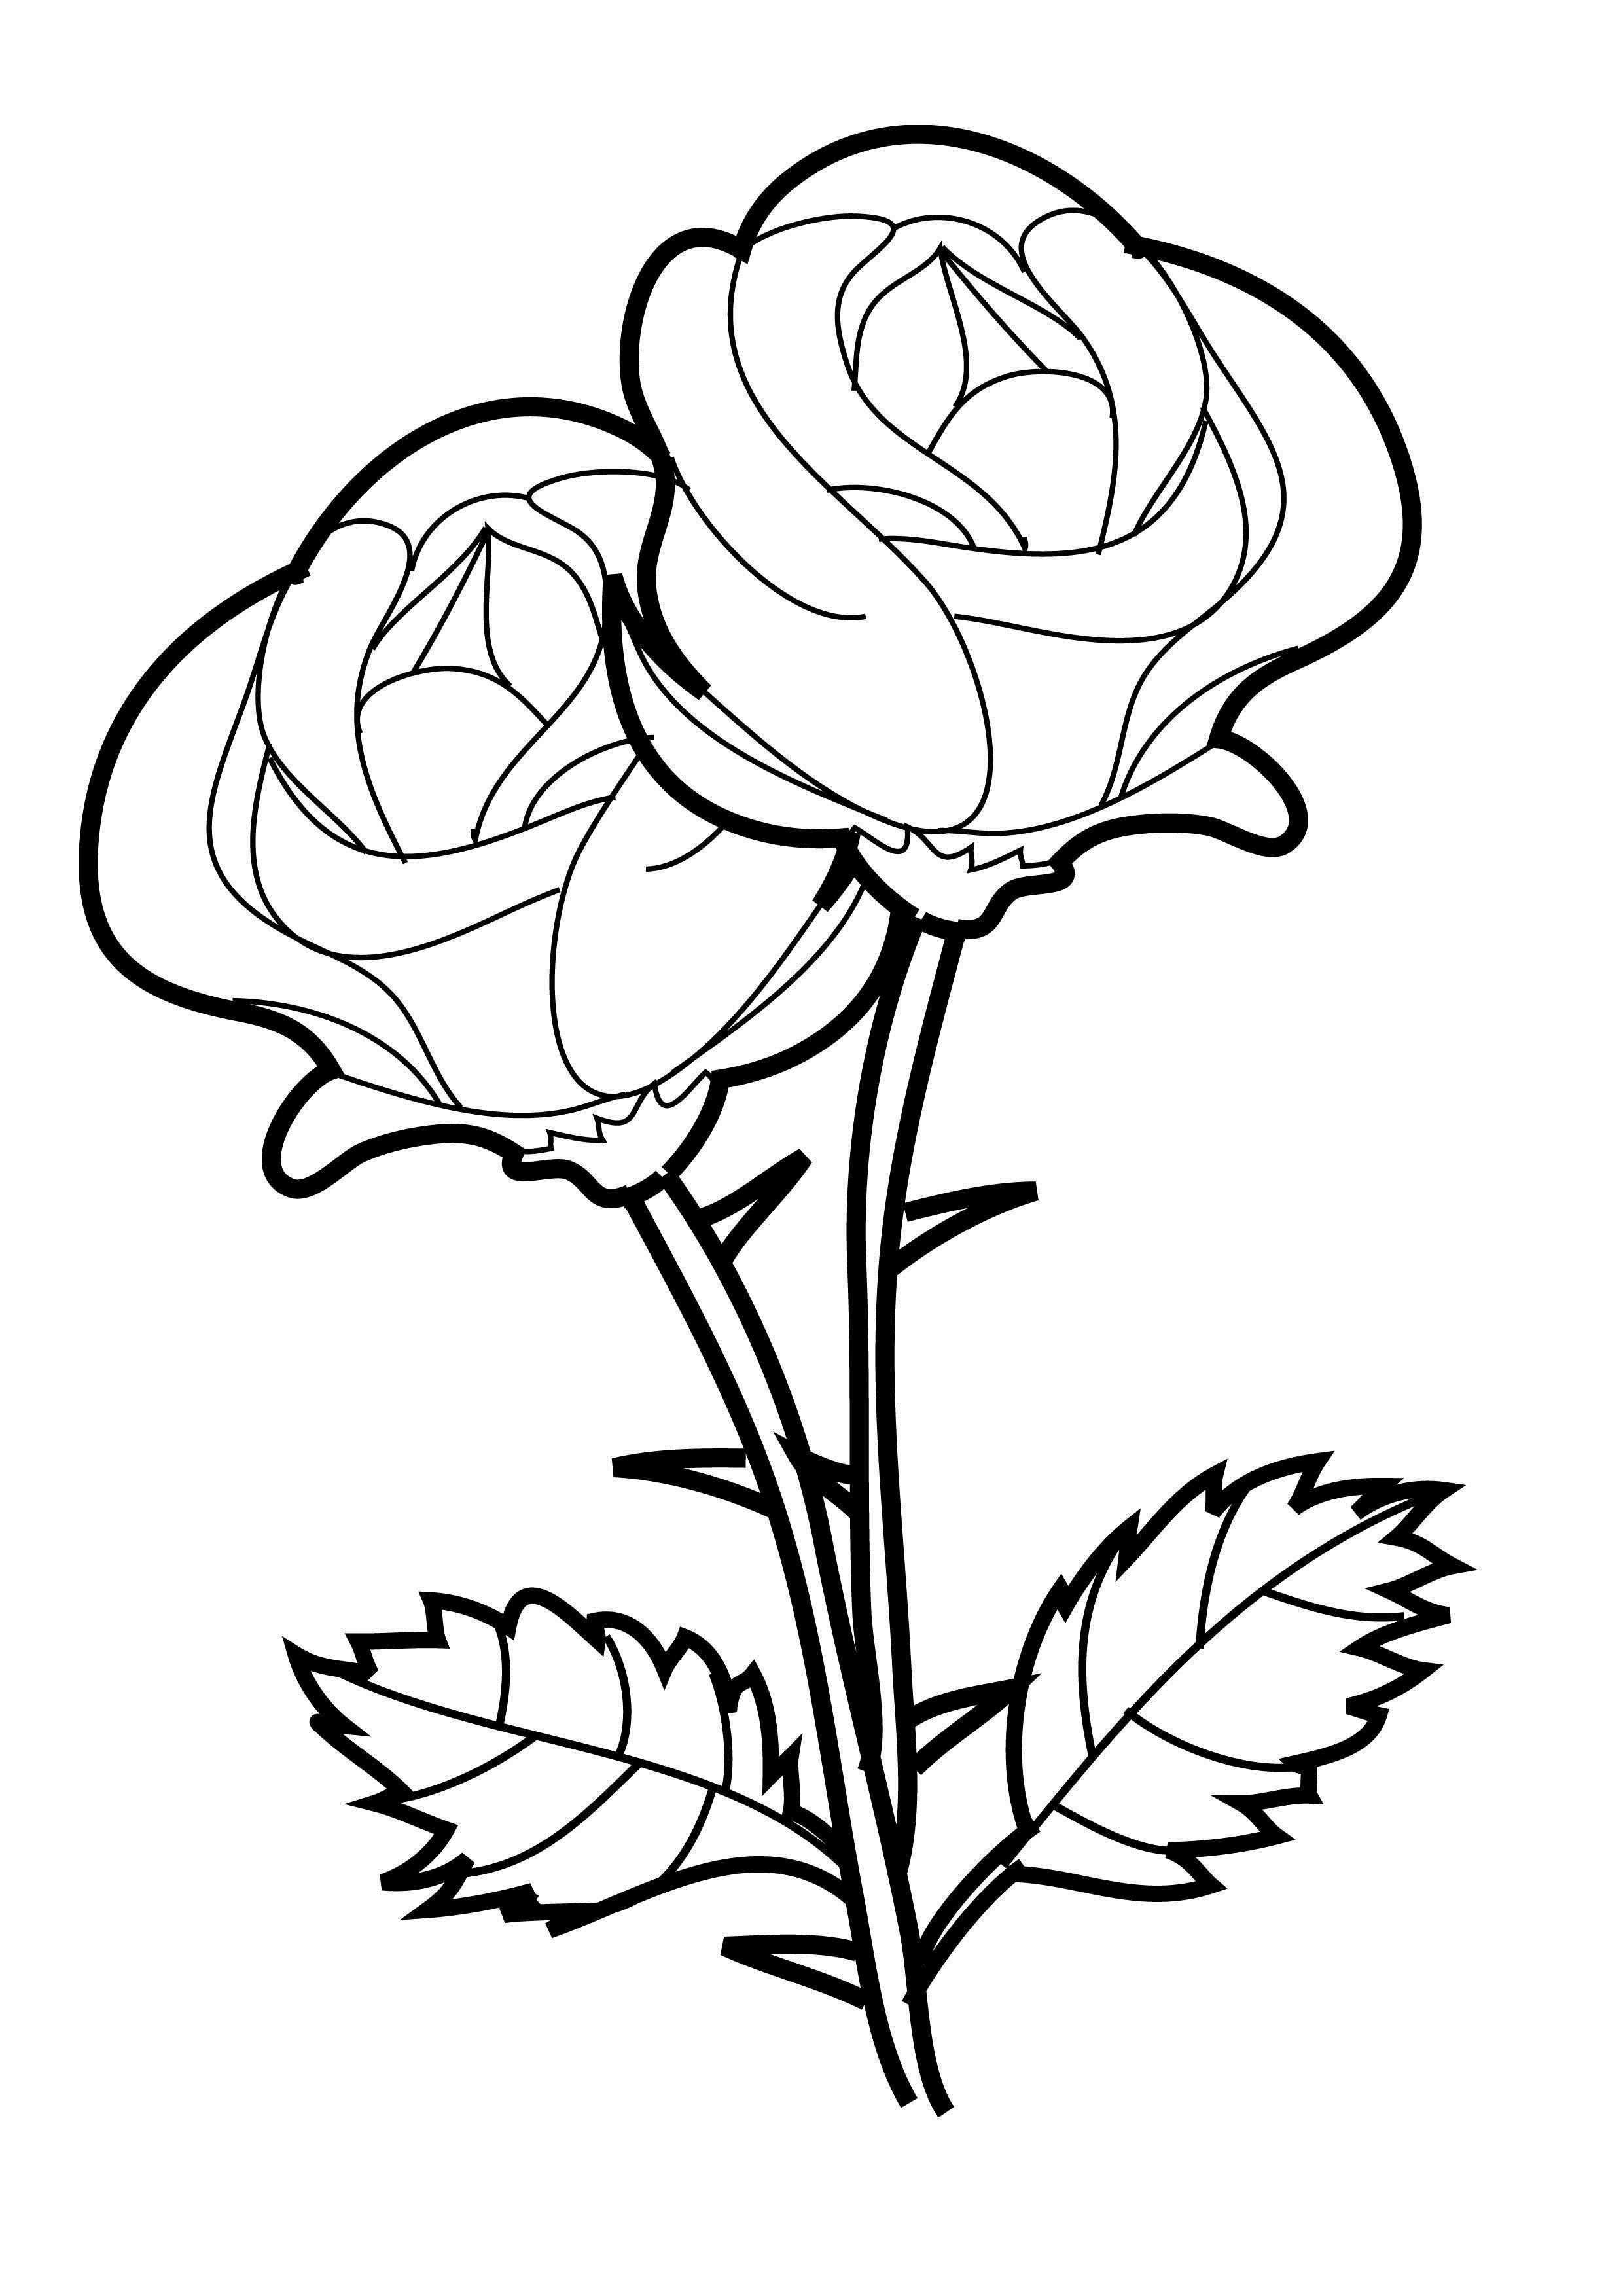 Rose Two Flowers Coloring Page Kleurplaten Rose Bloemen